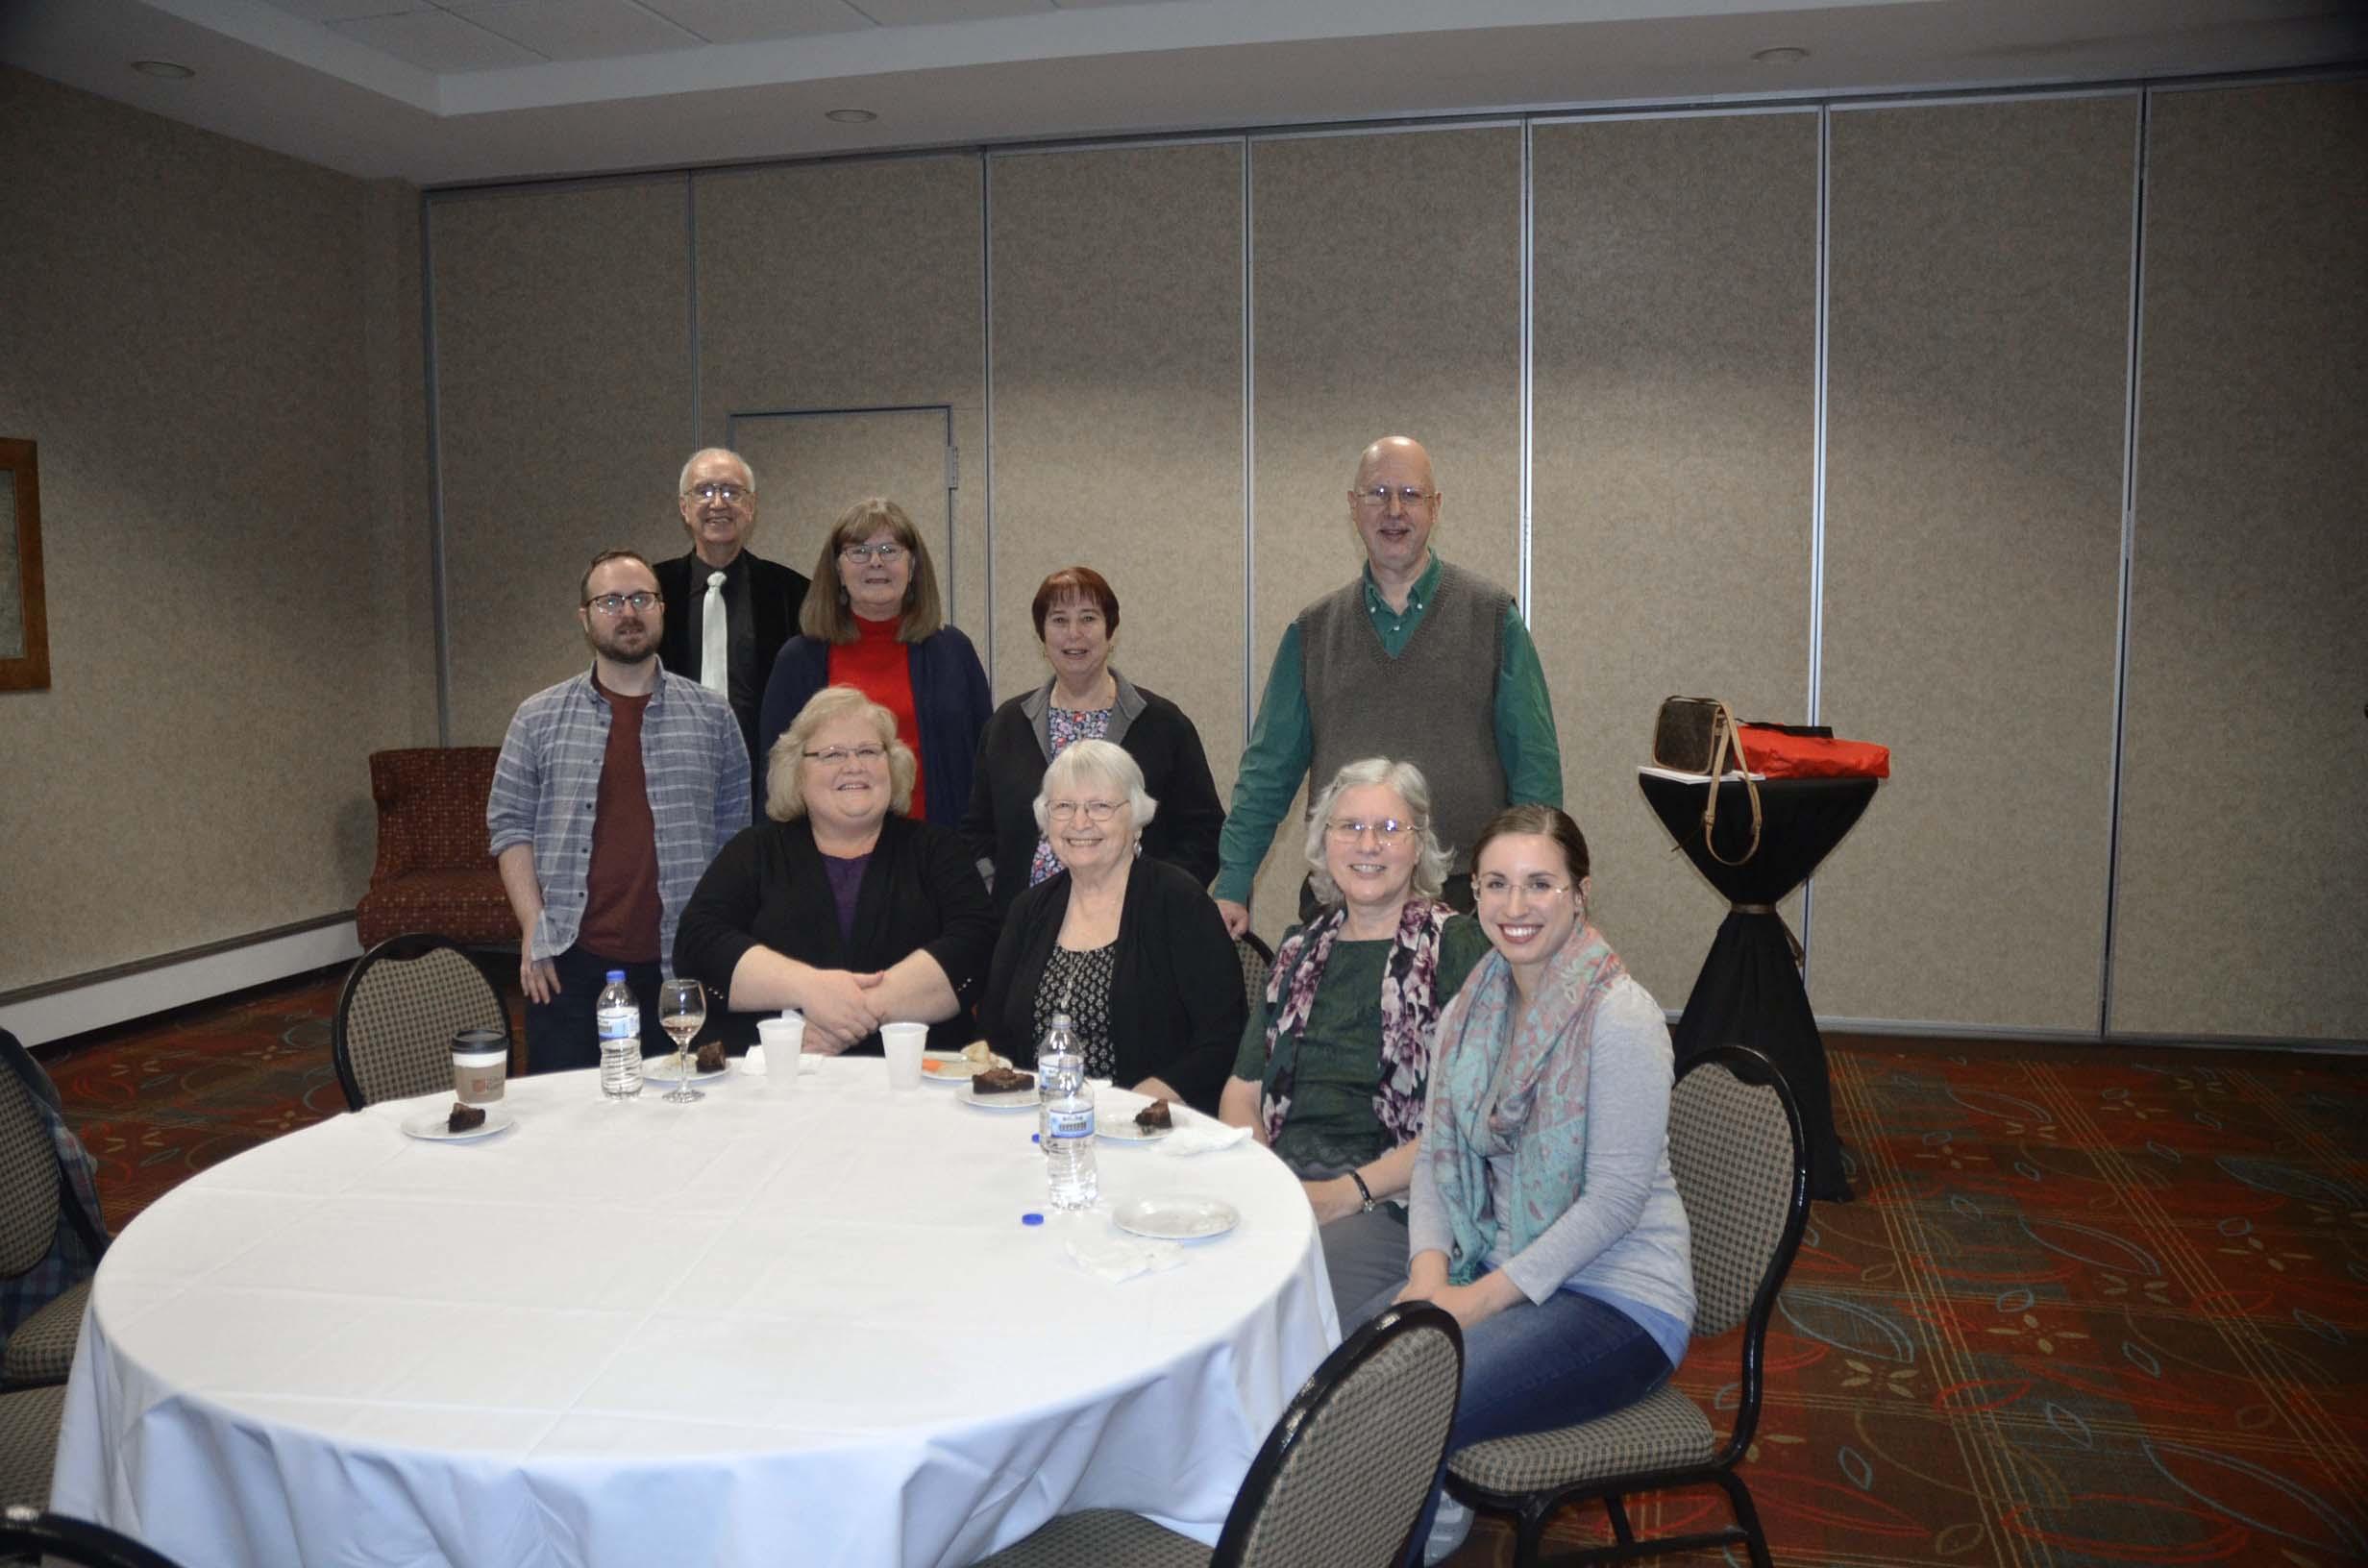 Fall 2018 Welcome Reception: Jim Fuhr, Linda Presto, Enid Zafran, Fred Leise, Ben Reike, Denise Alberts, Joy Dean Lee, Marilyn Augst, Shannon Li